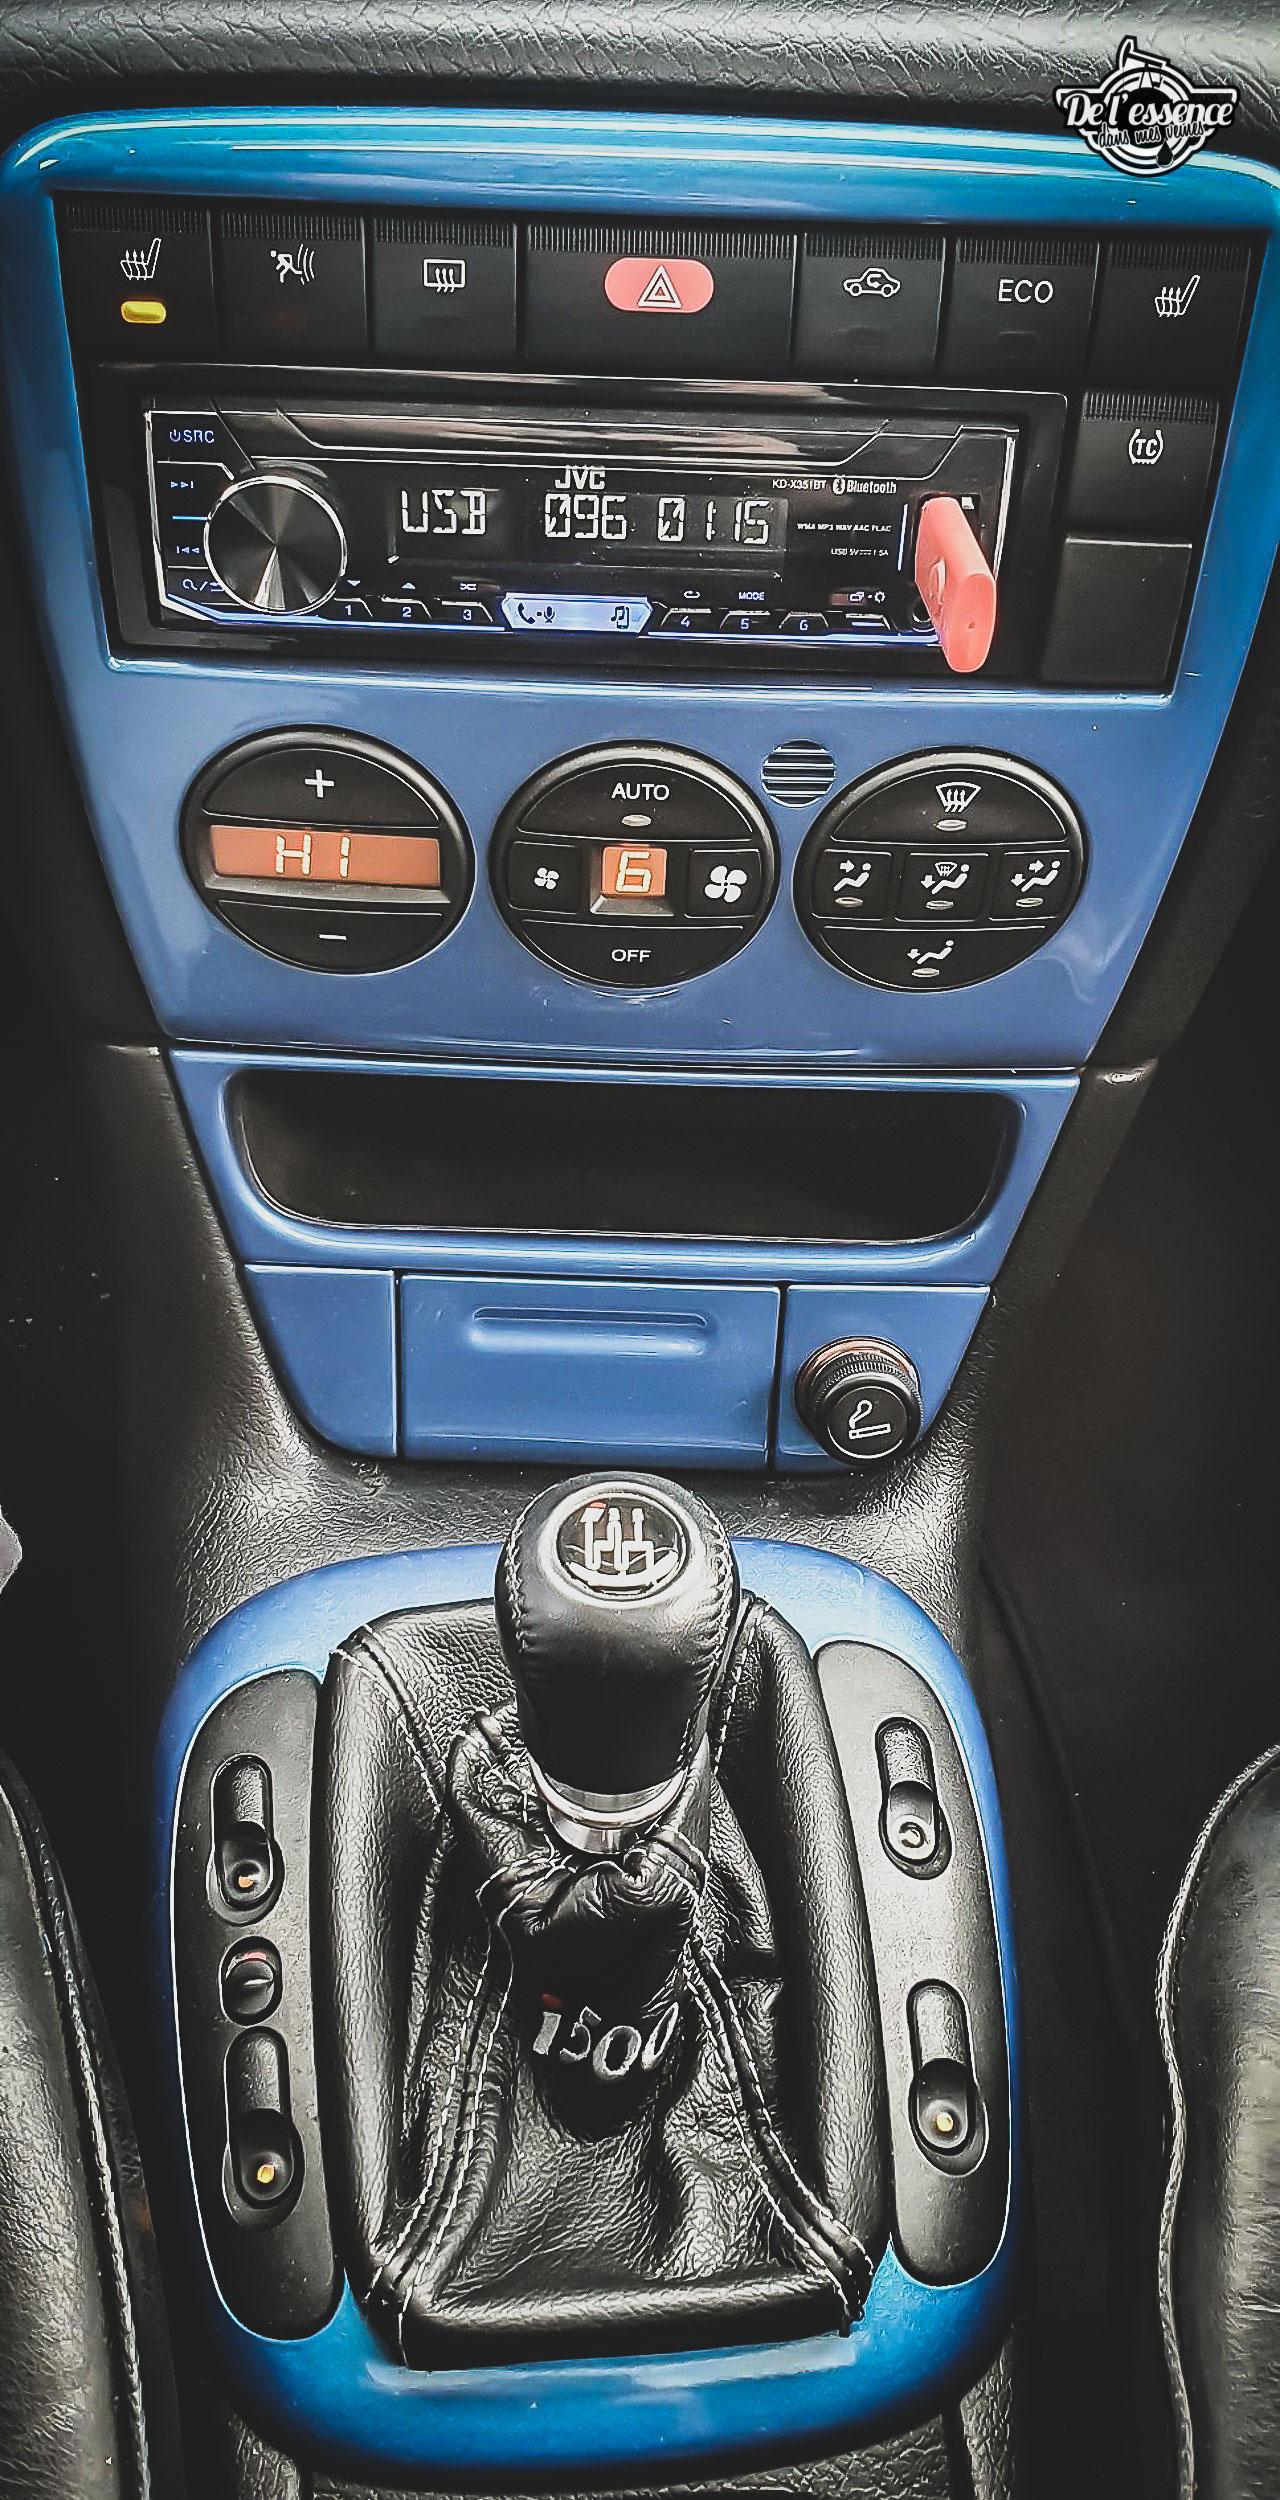 Opel Vectra V6 i500 replica... Papa pressé ! 10